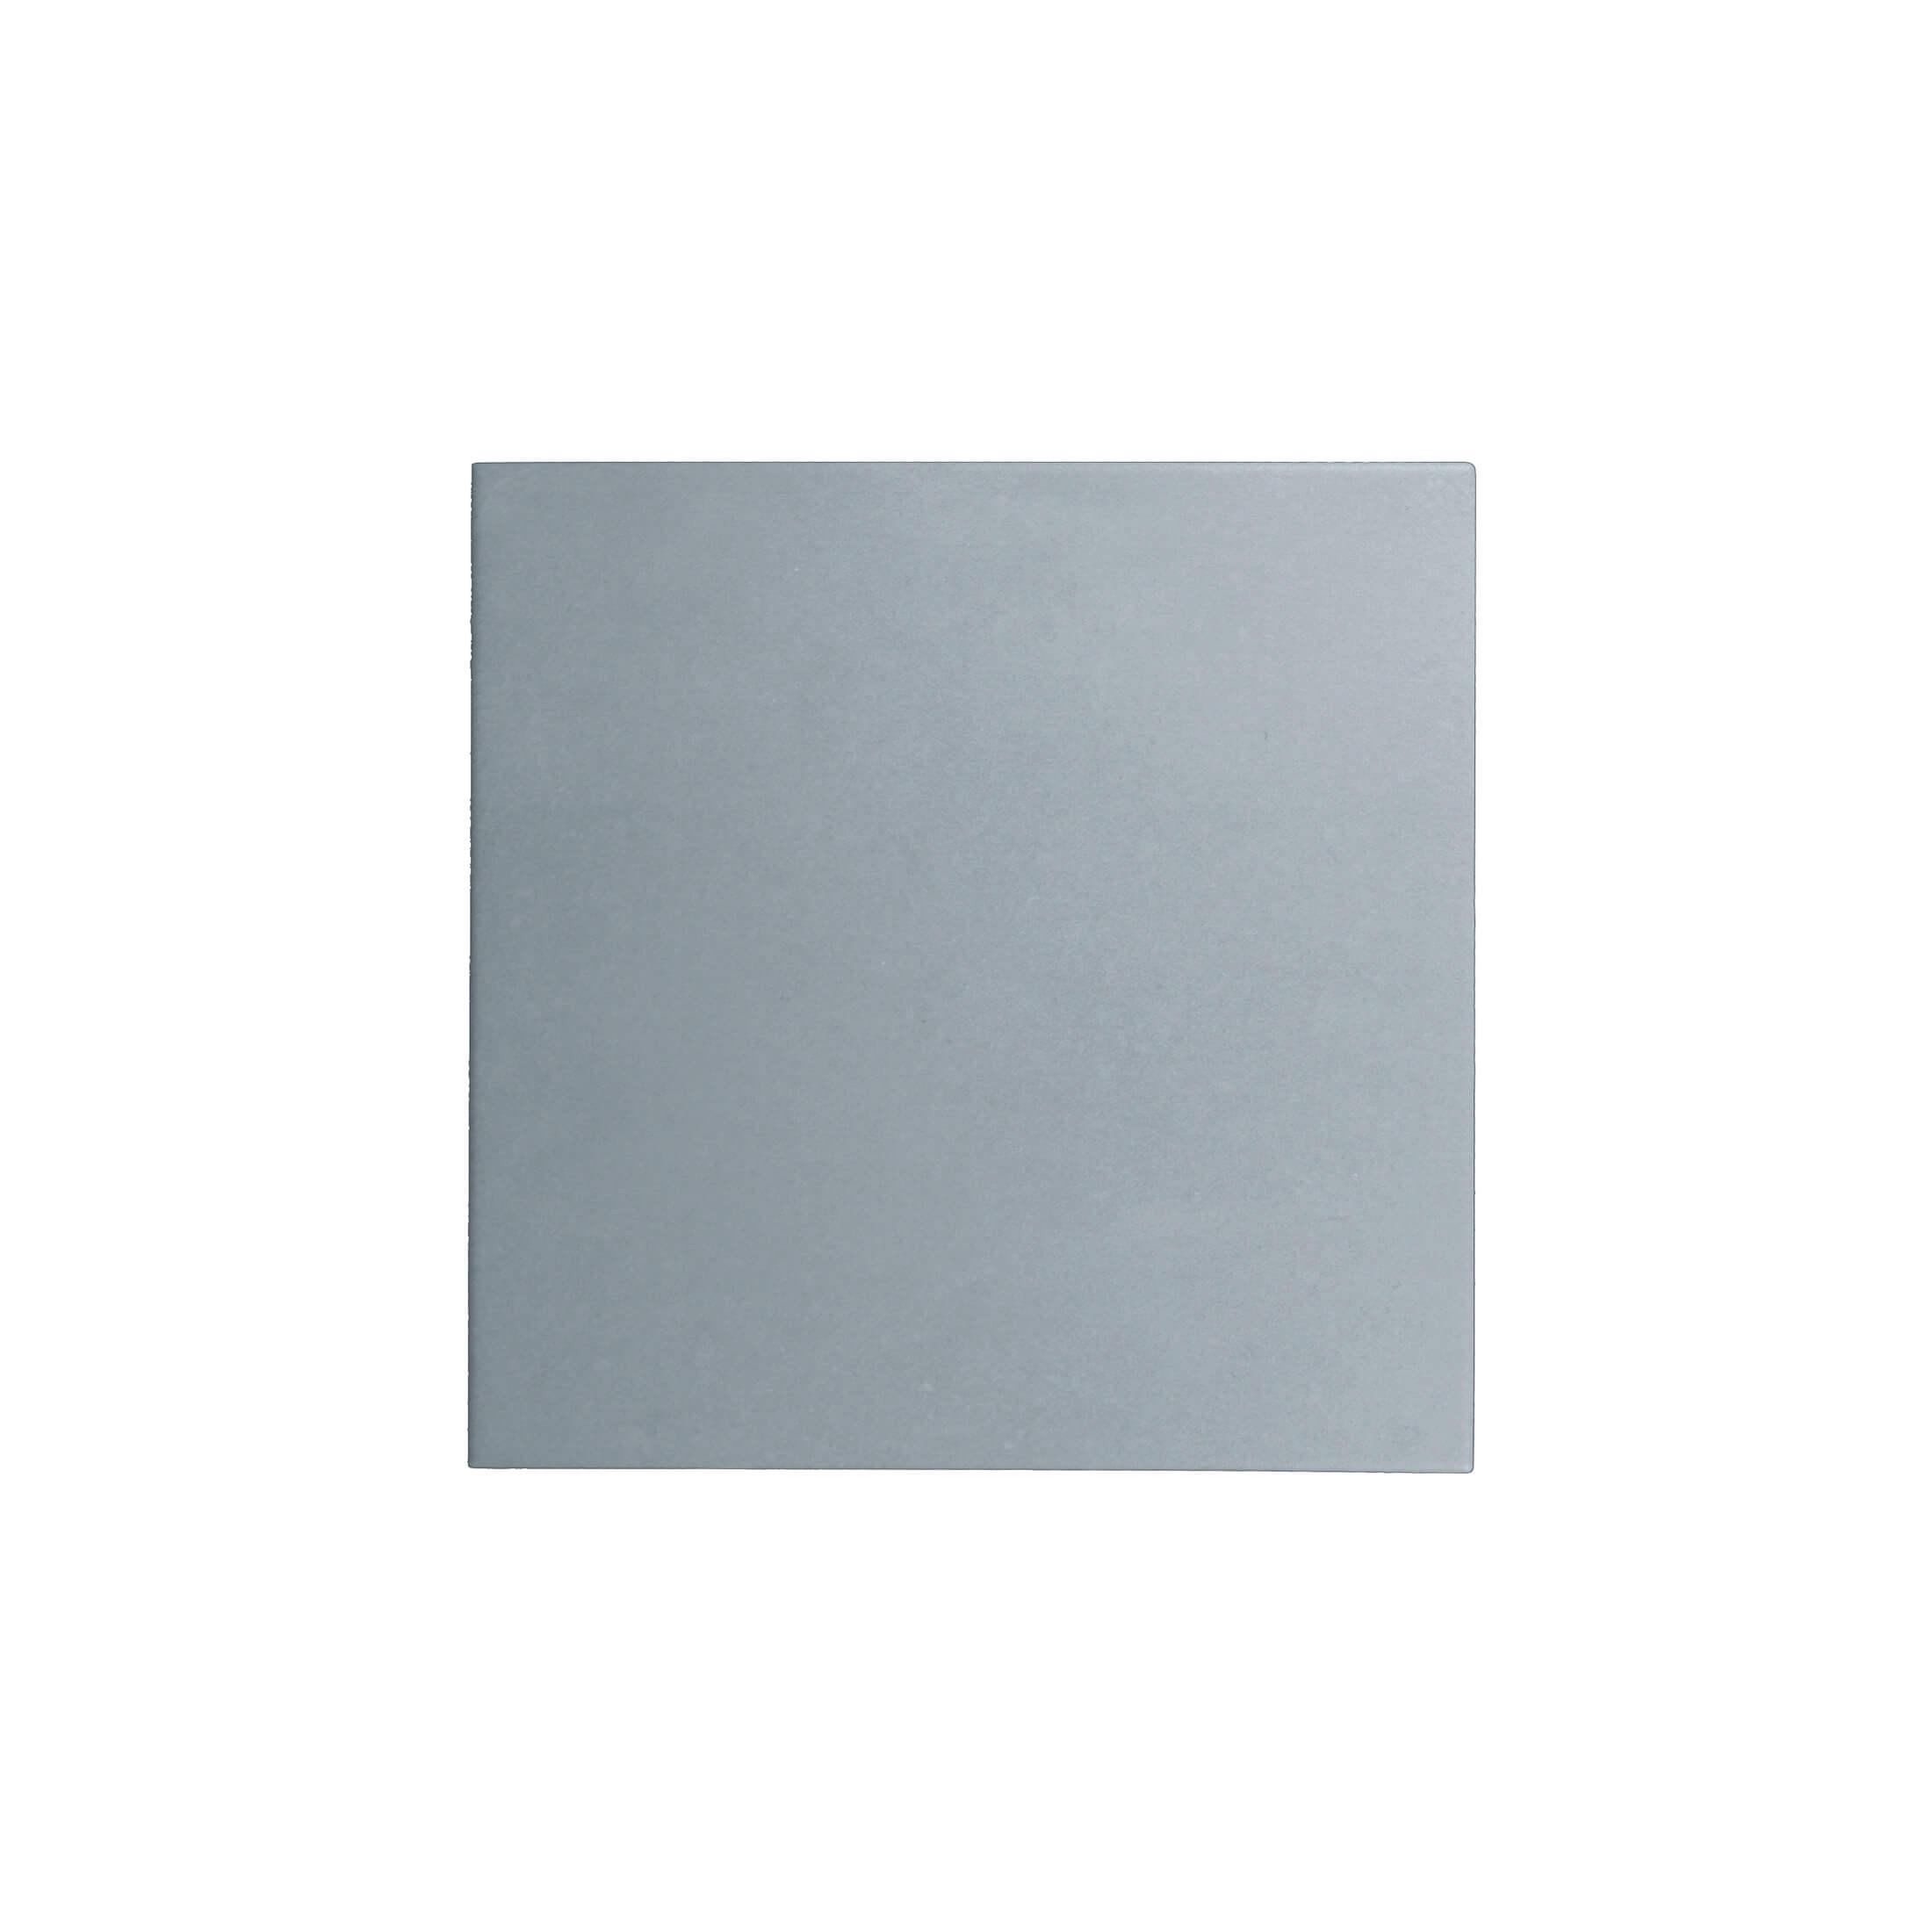 ADPV9027 - PAVIMENTO AZURE - 18.5 cm X 18.5 cm